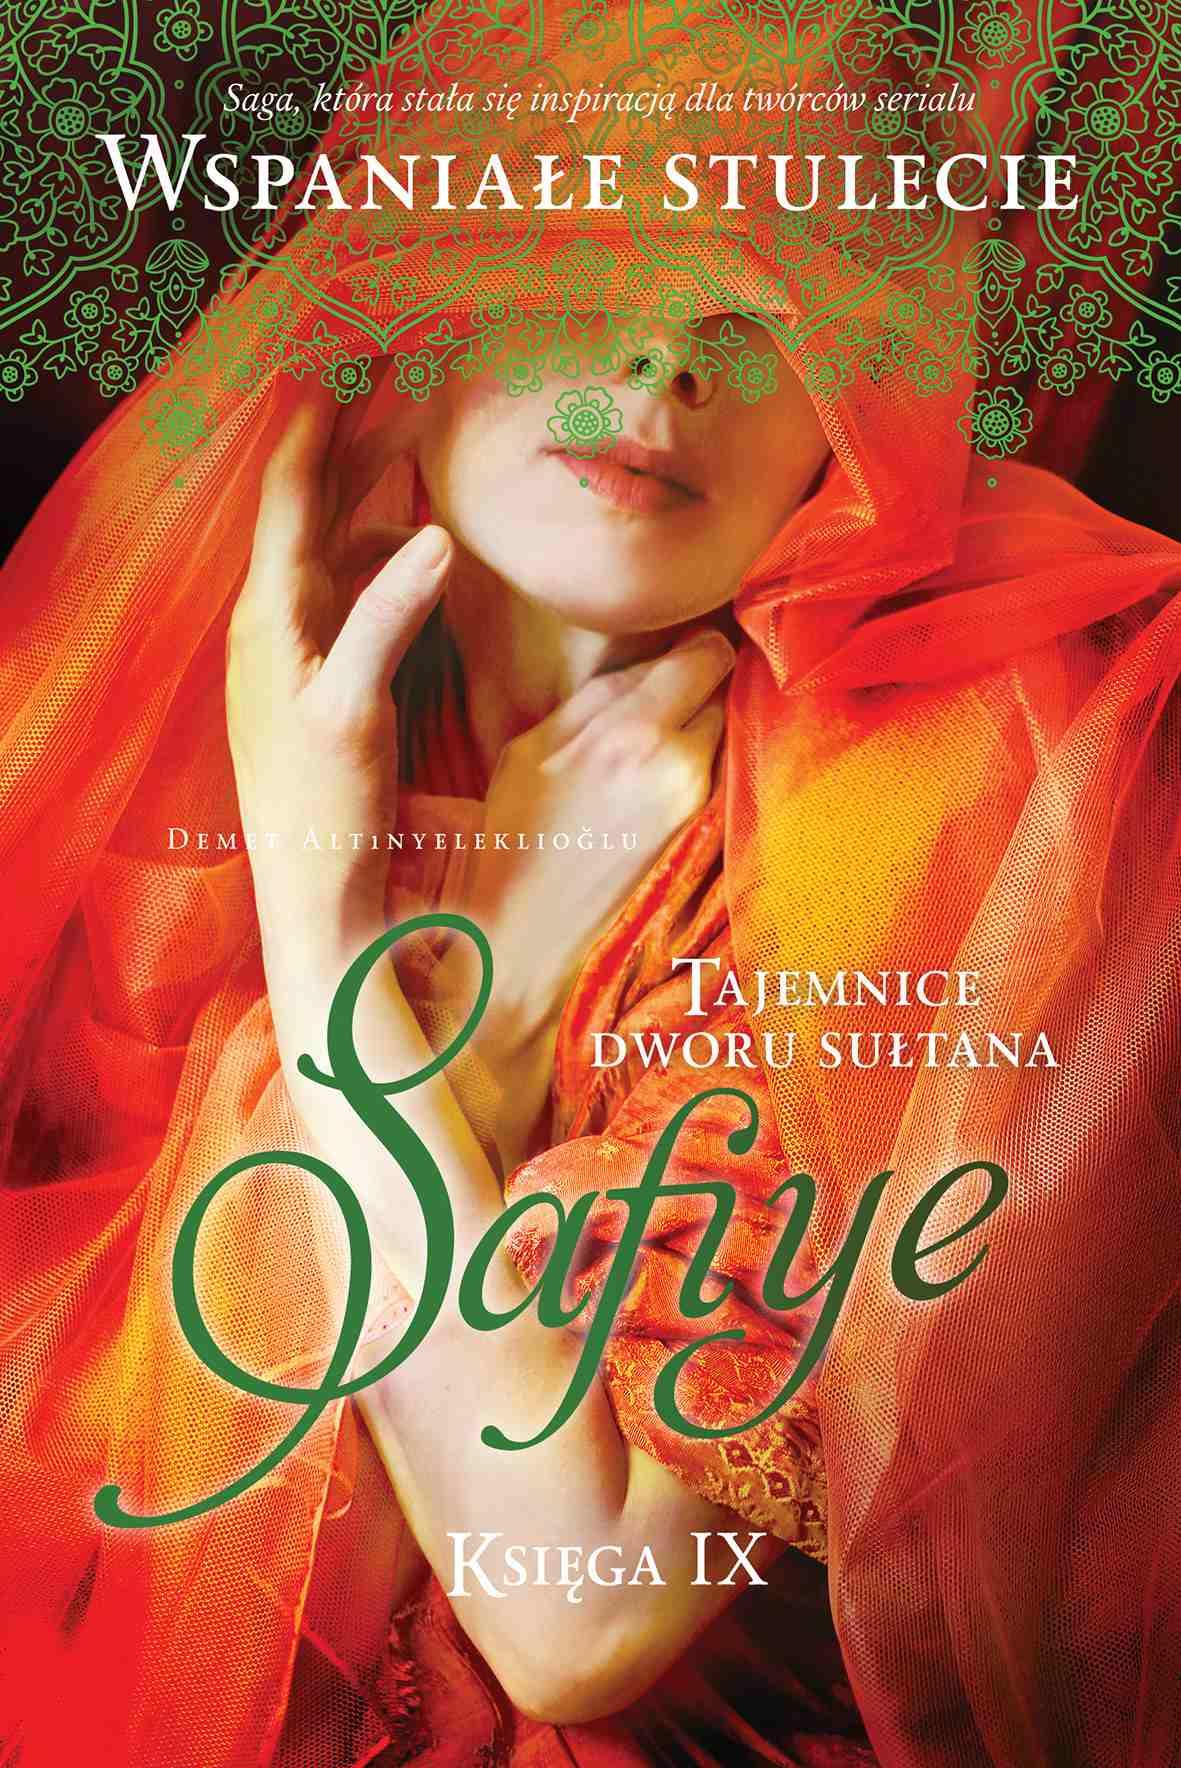 Tajemnice dworu sułtana. Safiye. Księga 9 - Ebook (Książka na Kindle) do pobrania w formacie MOBI